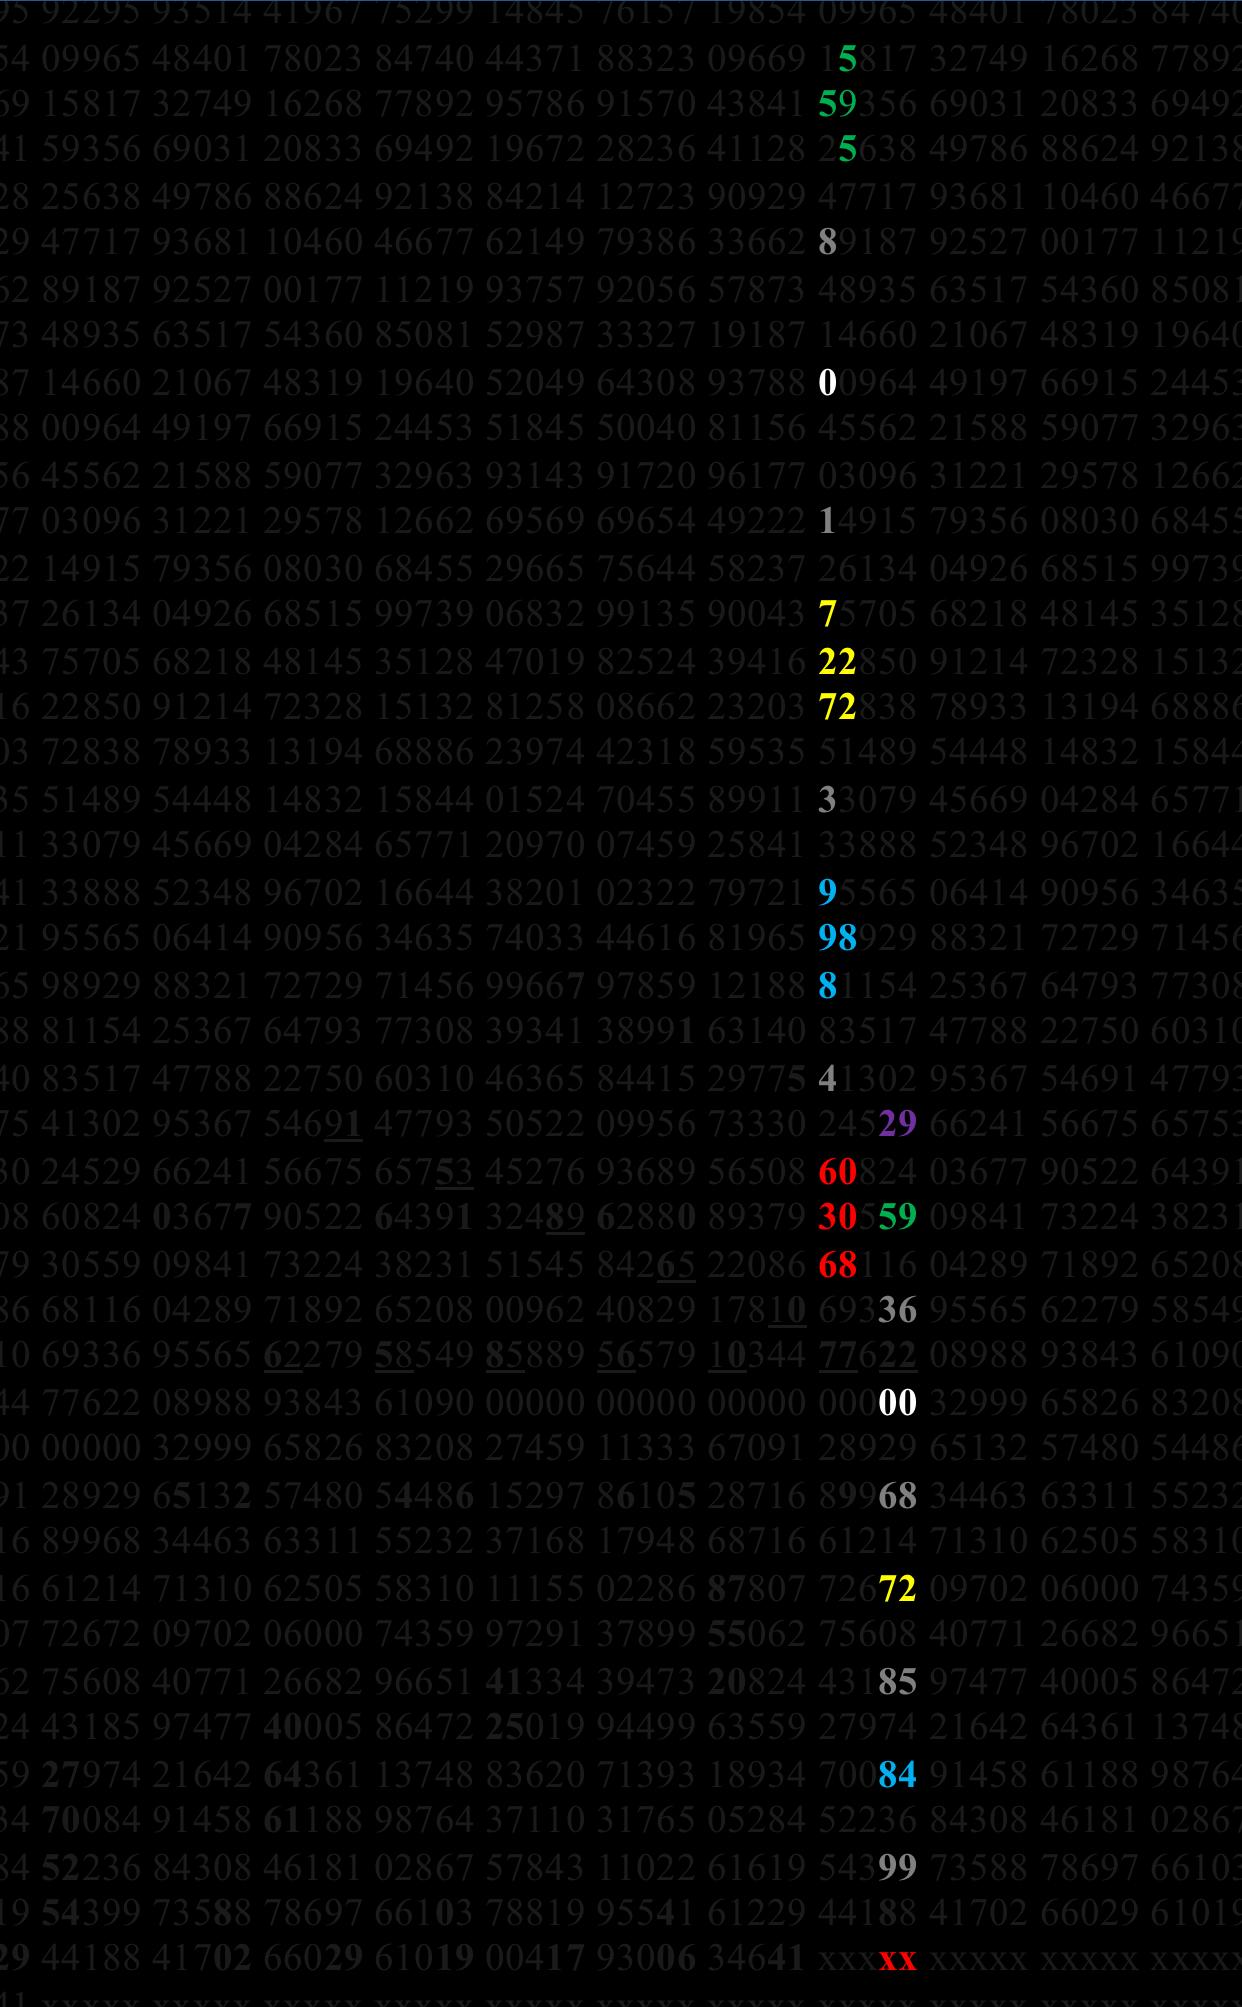 565BF4AC-66A5-4ABC-A8B2-14C3F9E7358D.jpeg